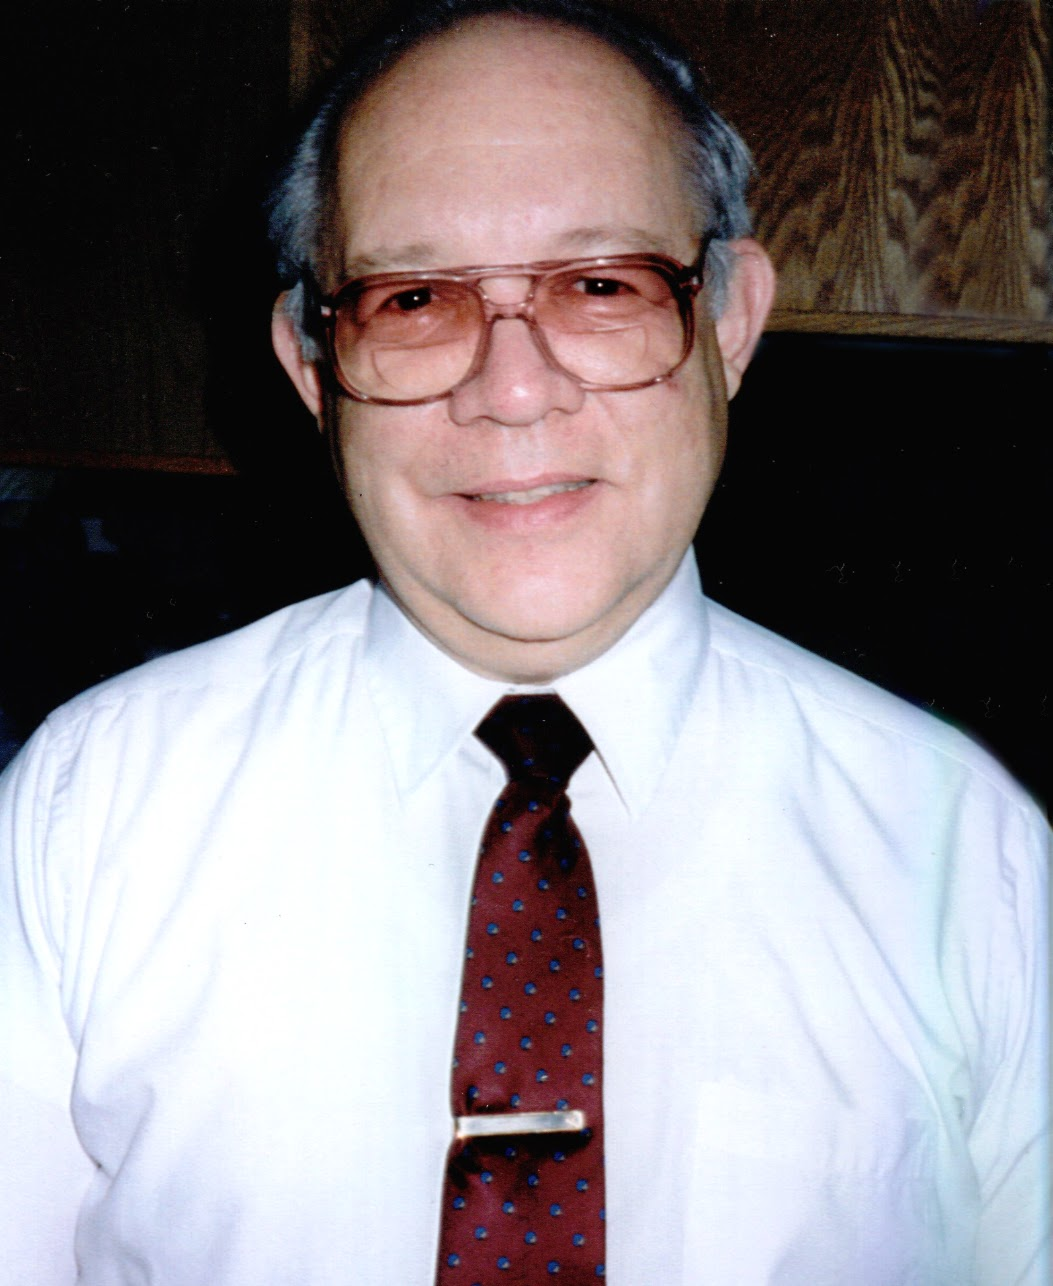 Patrick Bert Burchfield